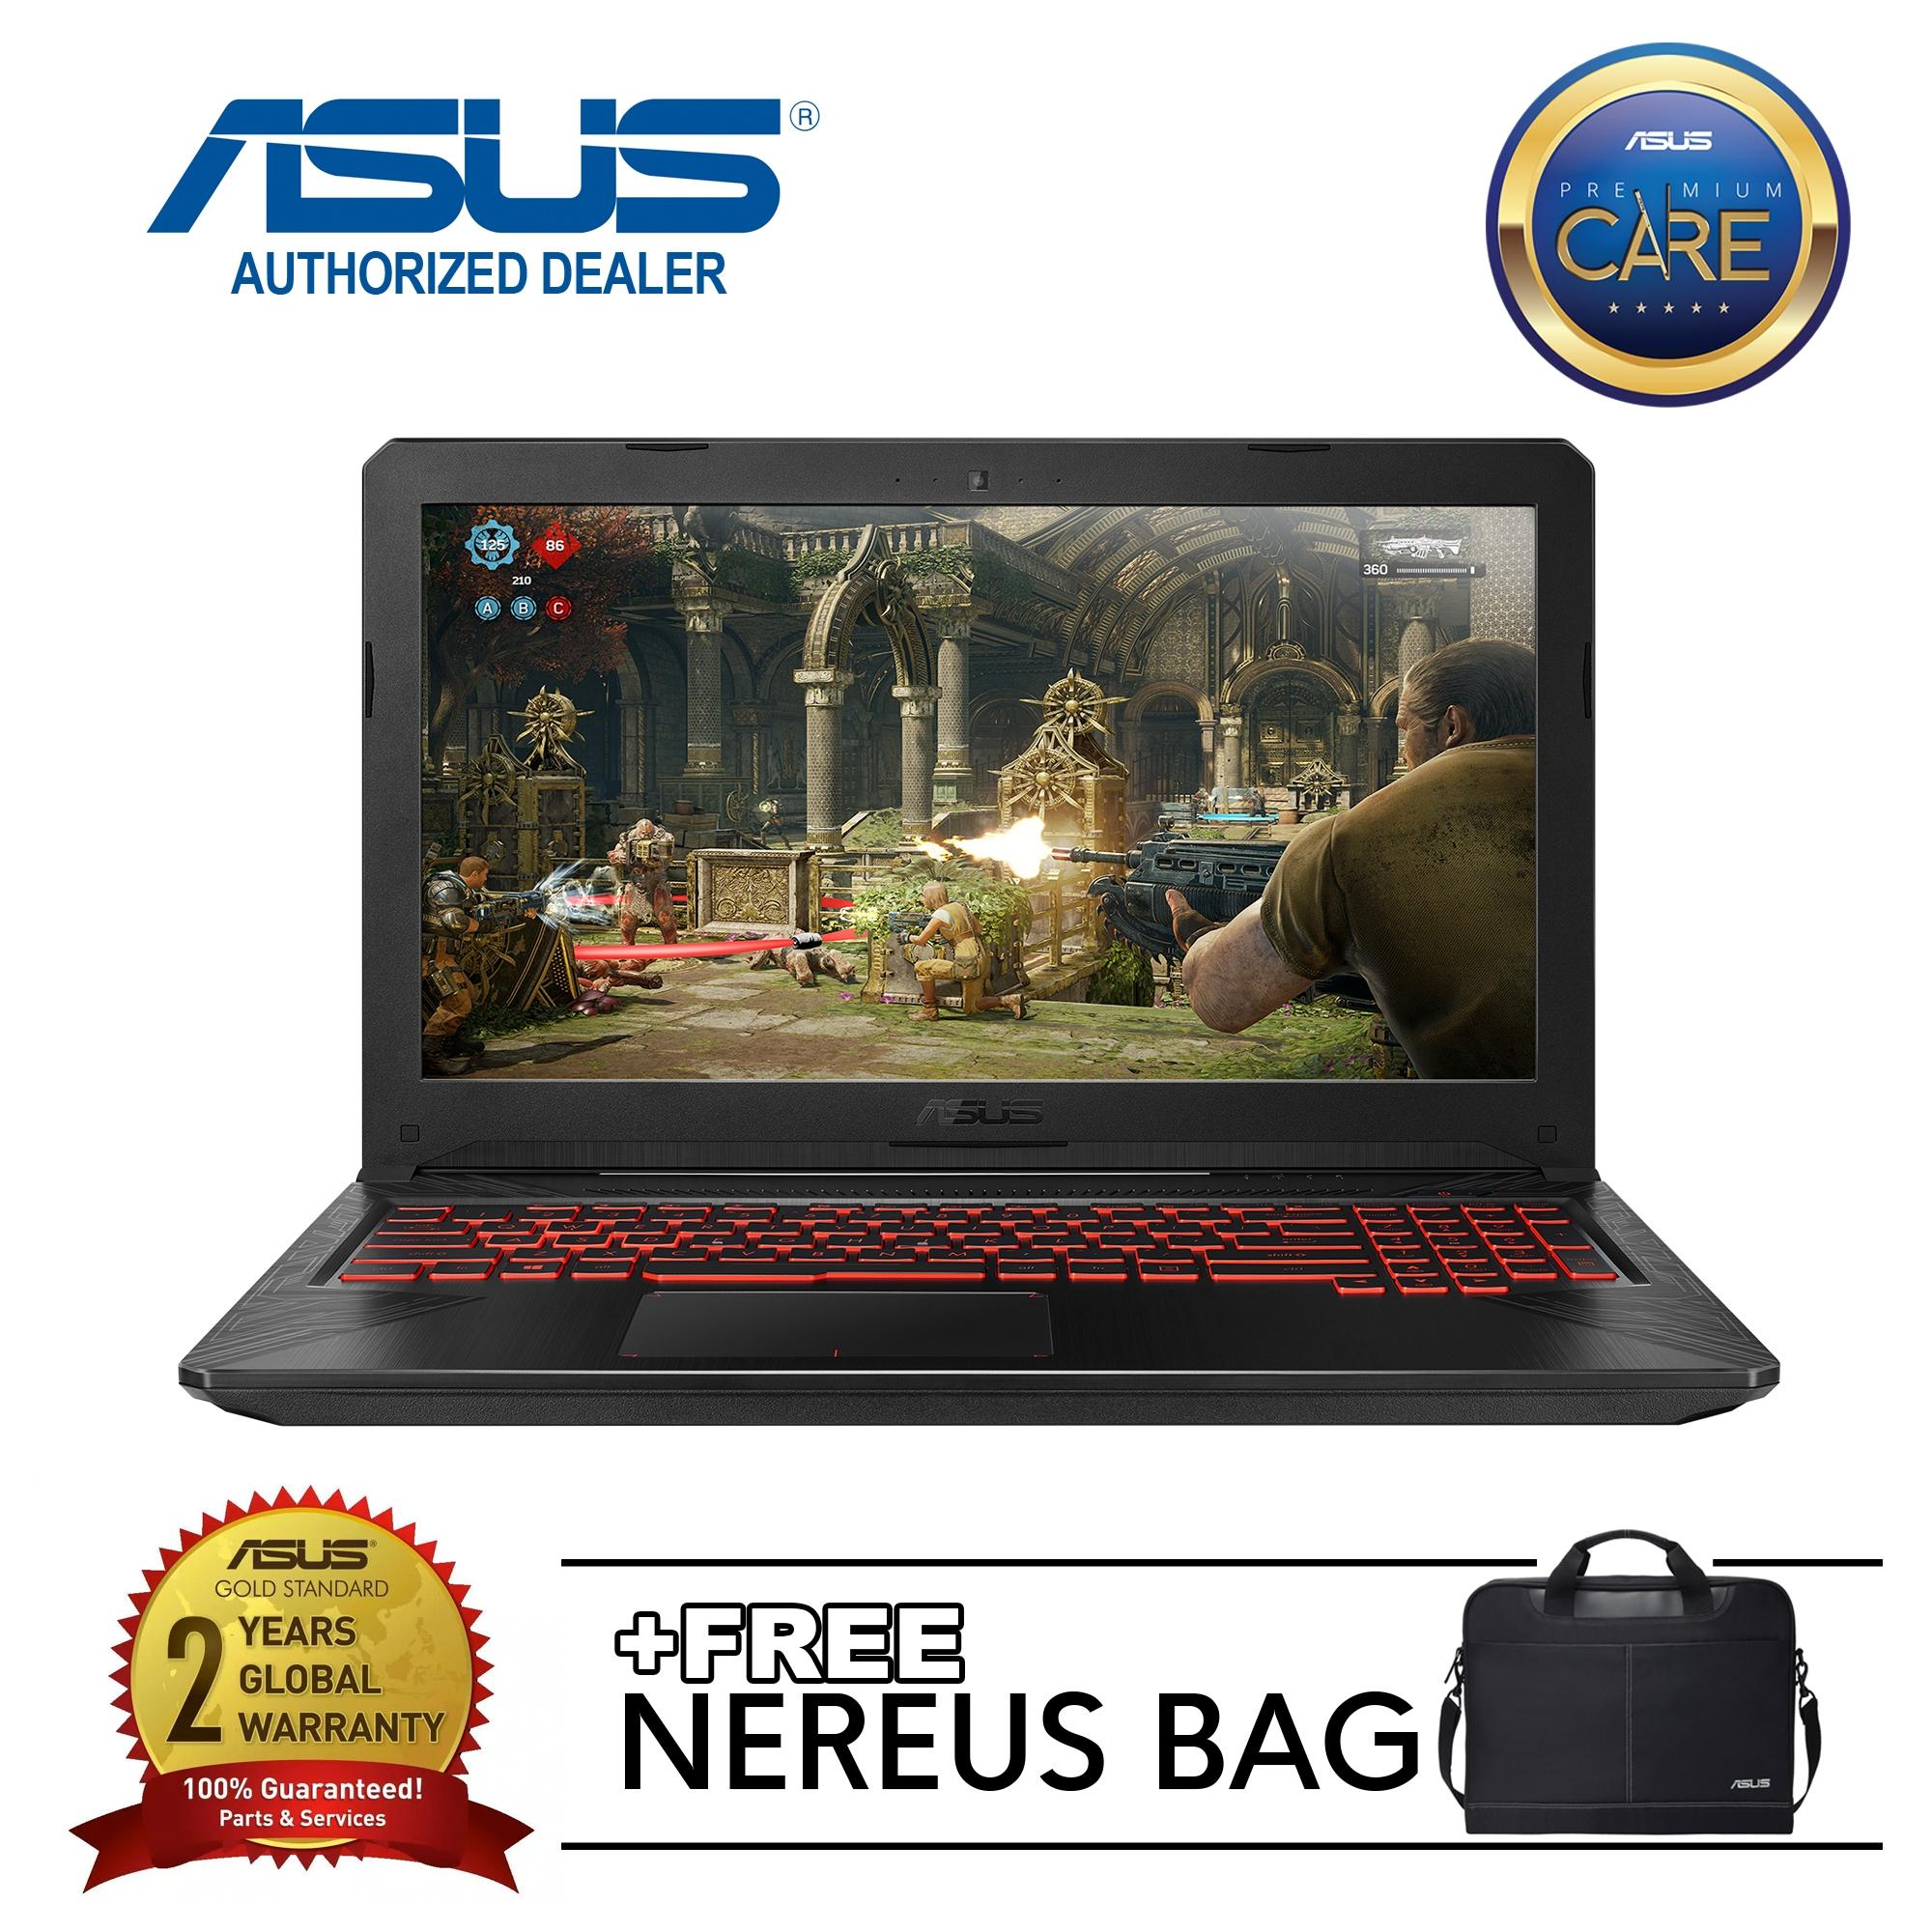 Asus Rog Gl552vx I7 7700hq 4gb Ddr4 1tb Hdd Win10 Gtx950m 15 6 Dm409t Intel Core 12gb Ram Geforce 156 Inc Tuf Gaming Fx504ge En179t Kaby Lake 8th Gen Hexacore 8gb Sshd